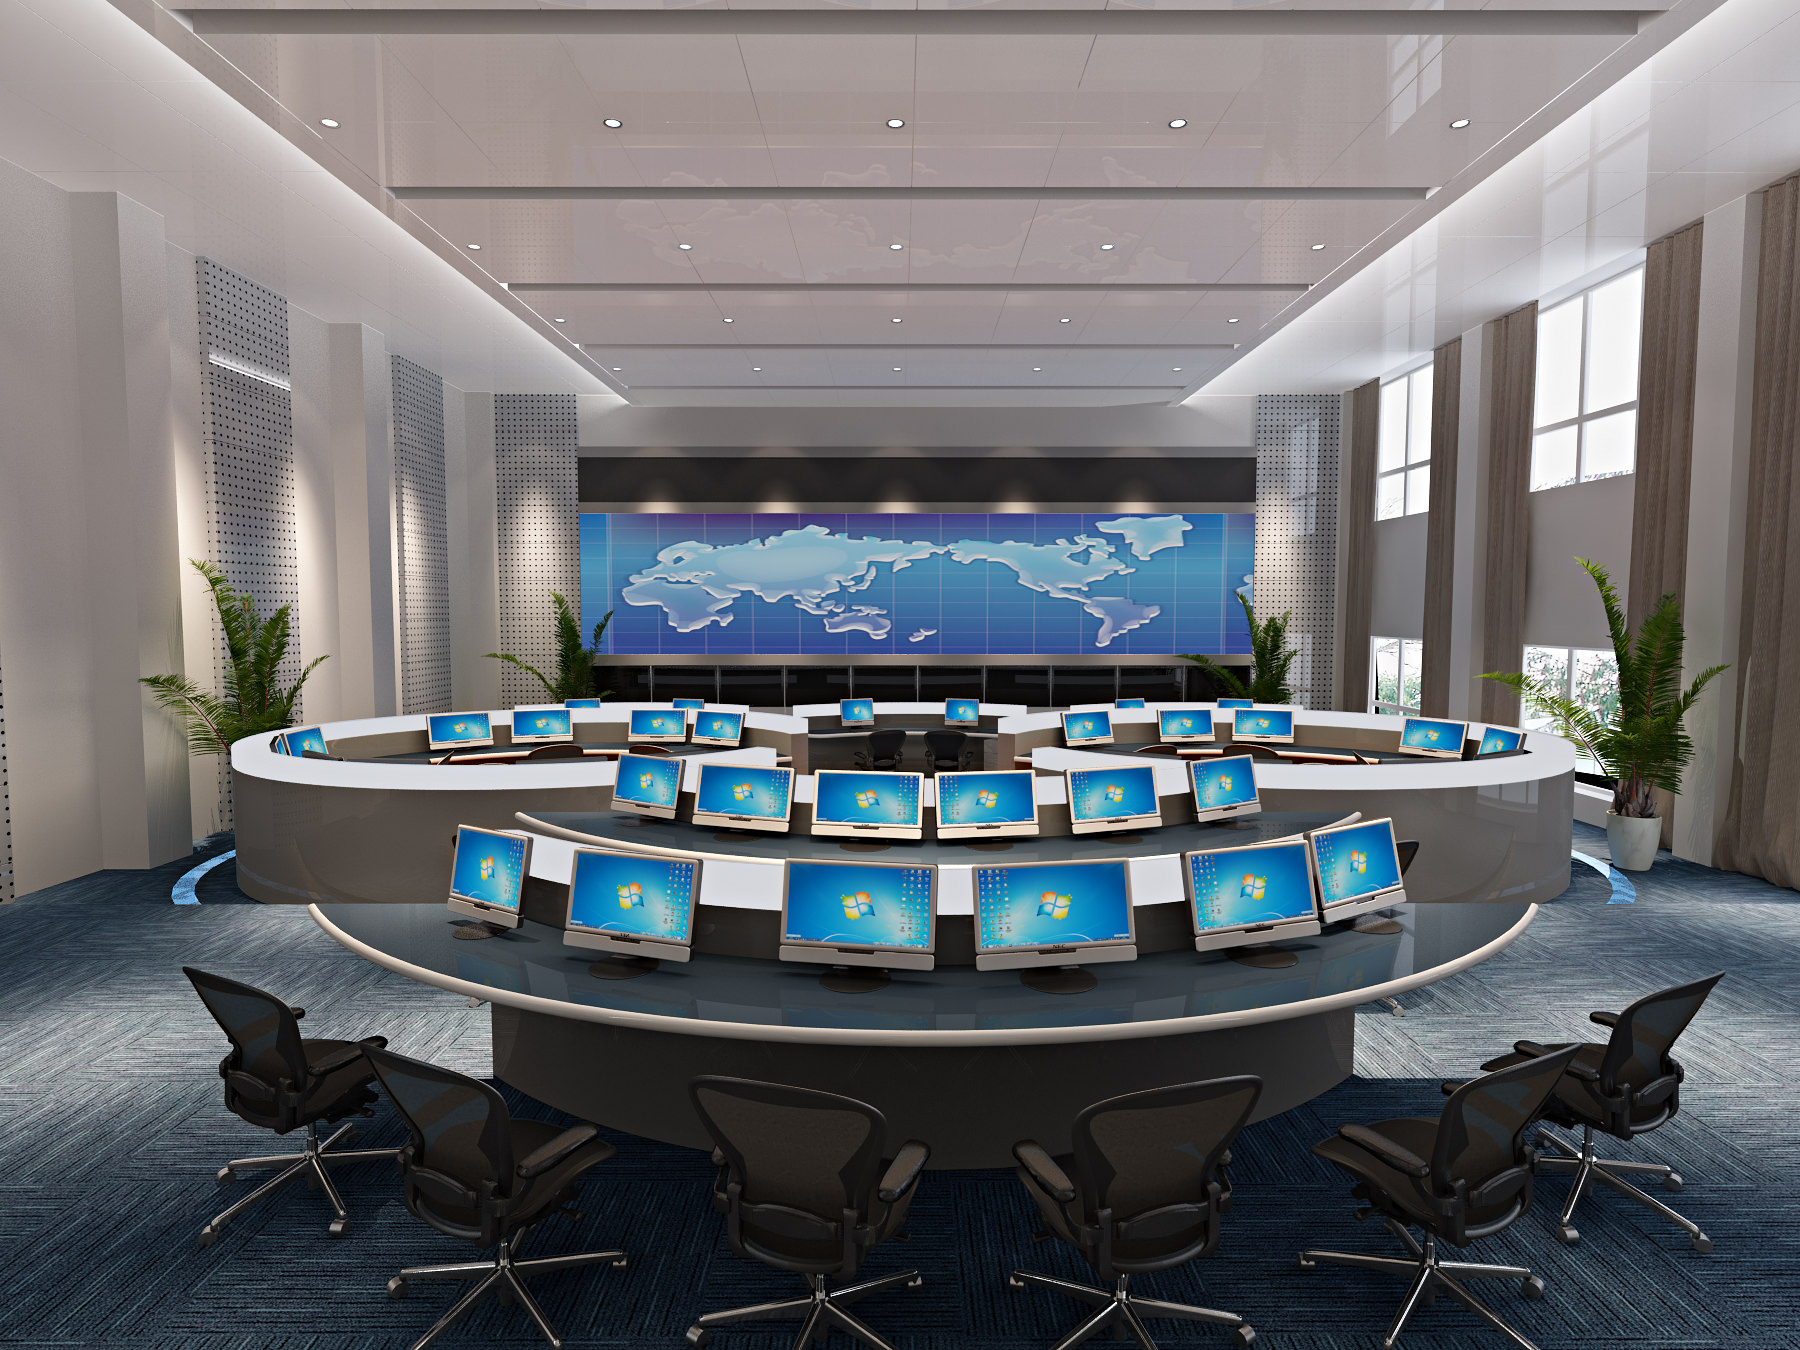 Office control room interior 3d model max for Office design 3d max